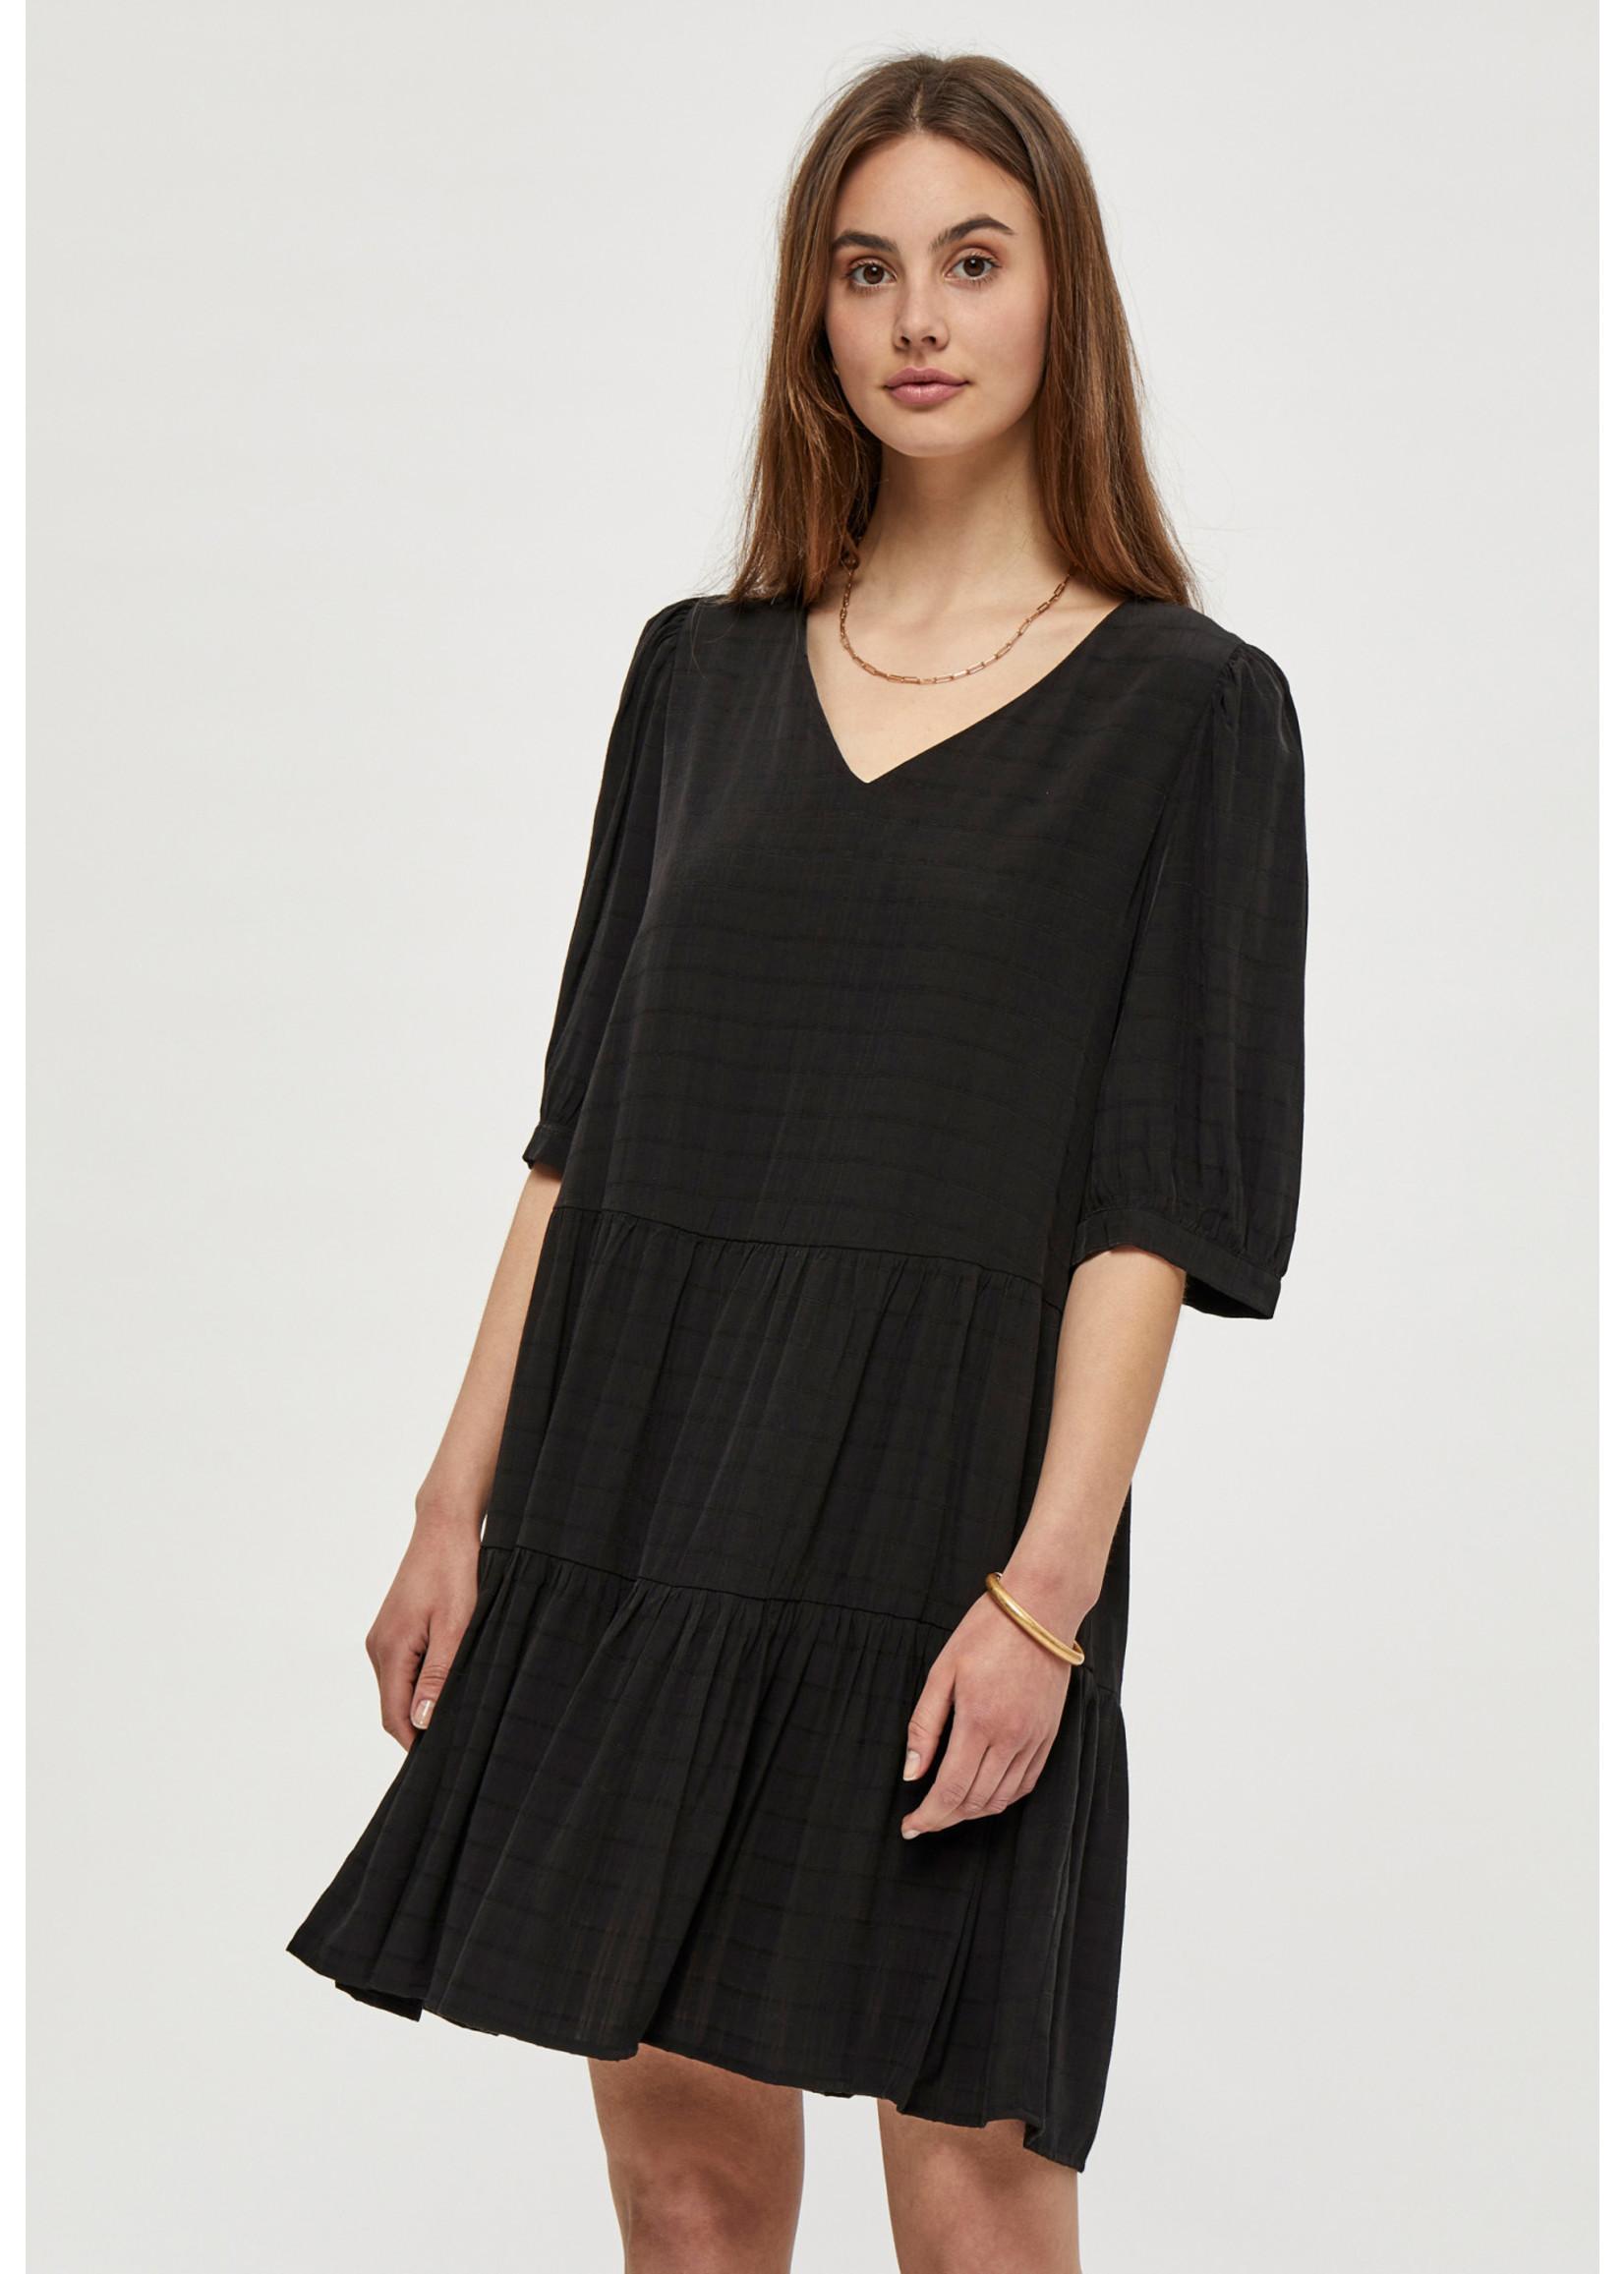 PEPPERCORN MARY LONG SLEEVE DRESS,black